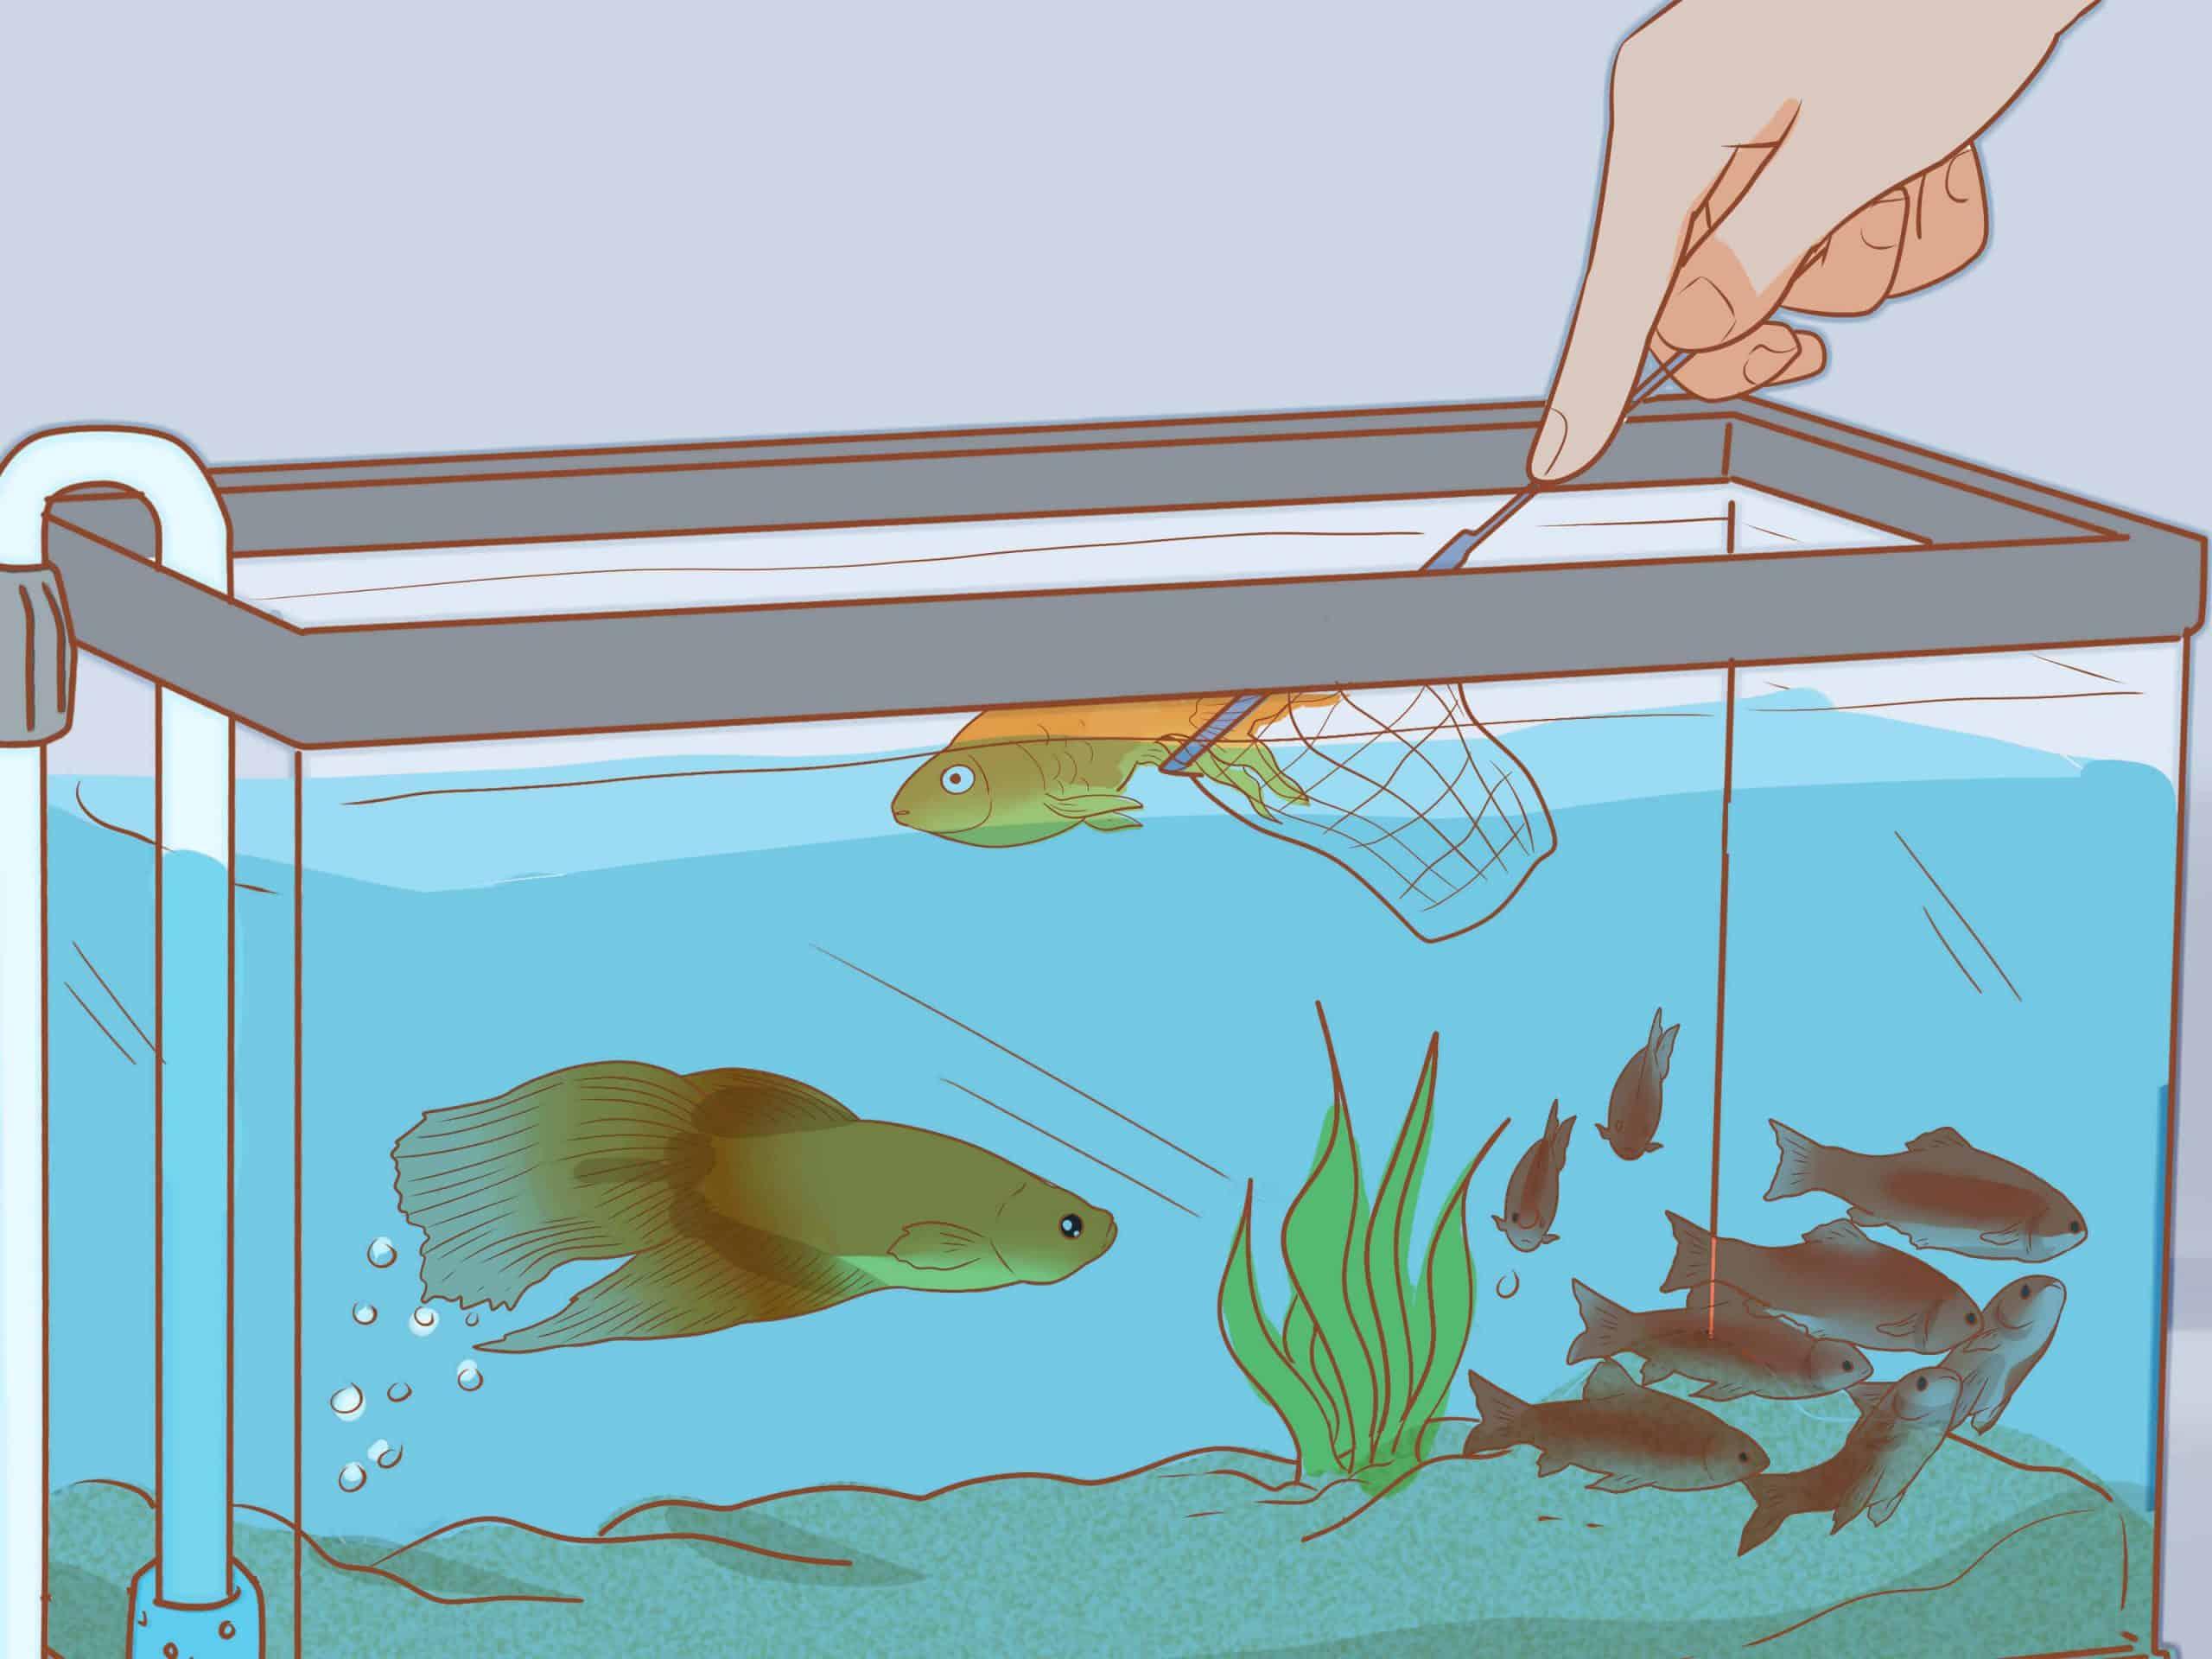 How To Add New Fish To Aquarium